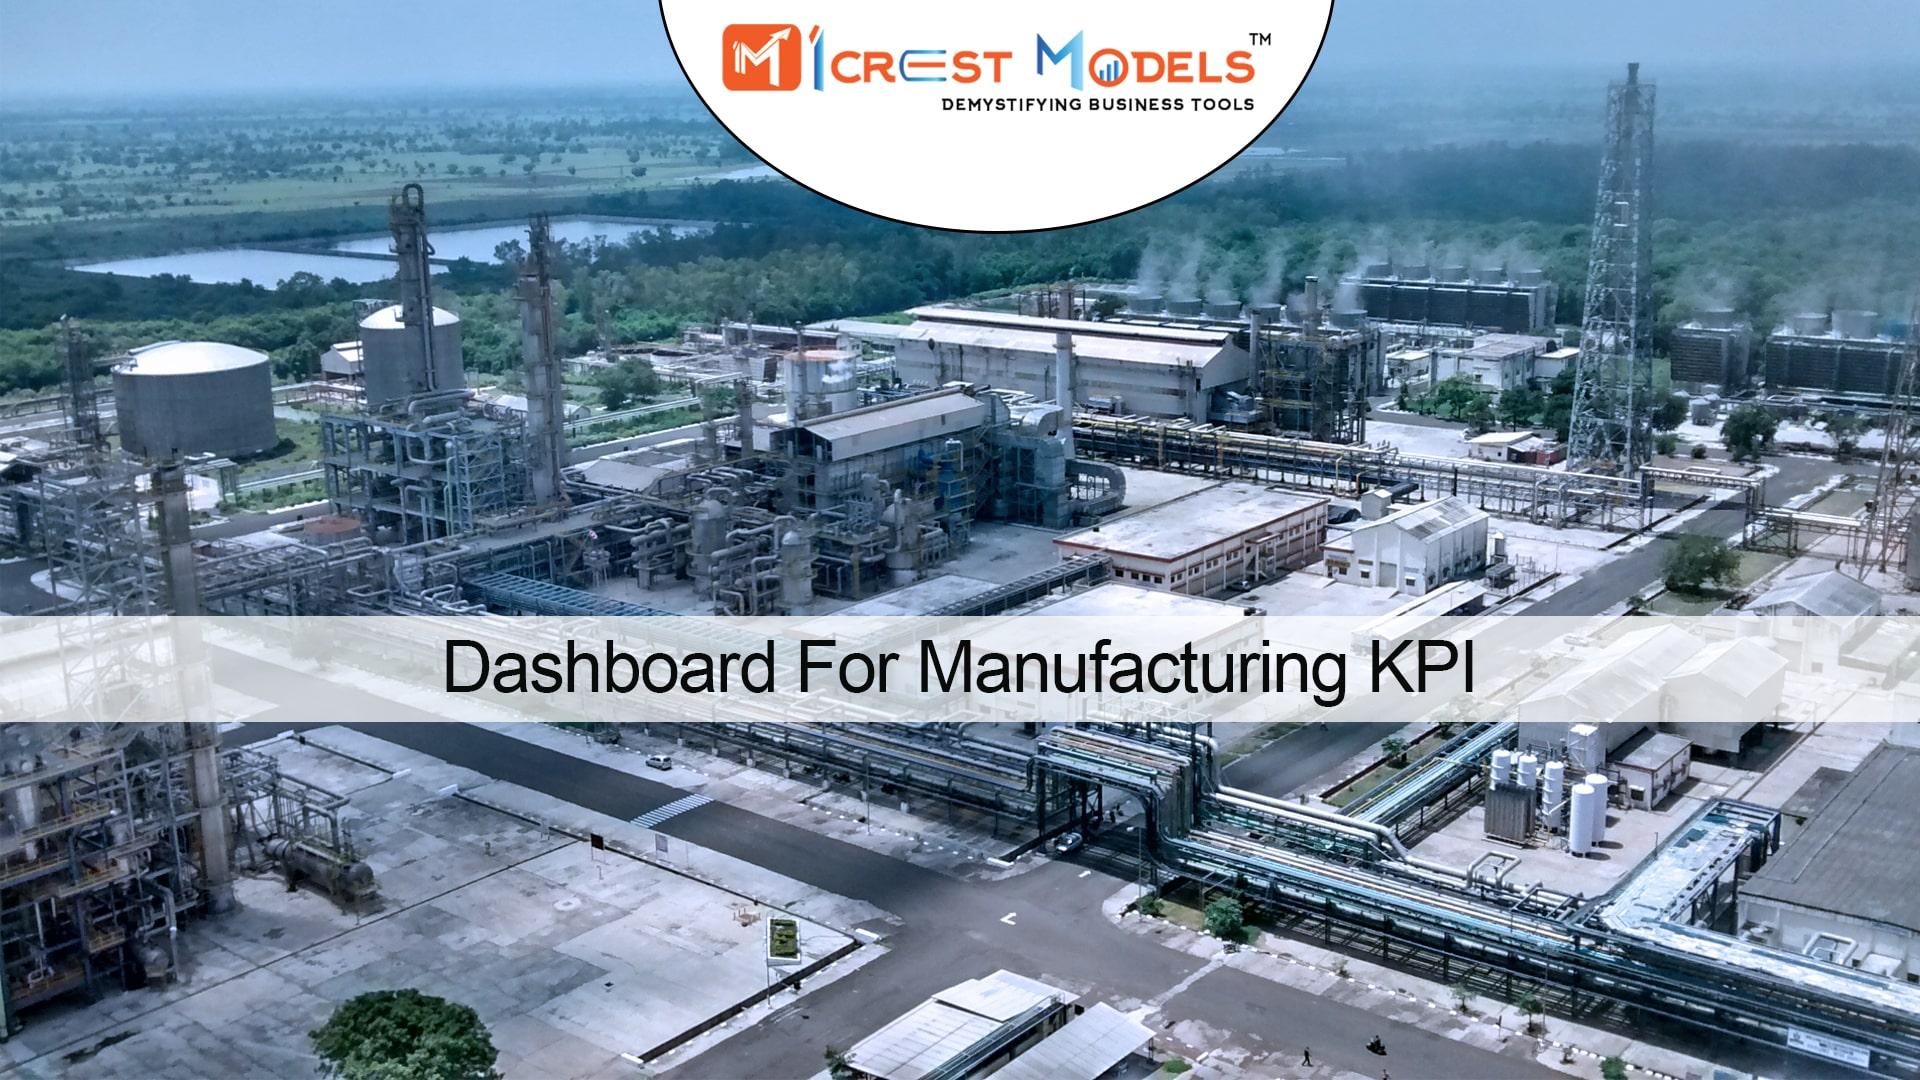 Dashboard For Manufacturing KPI